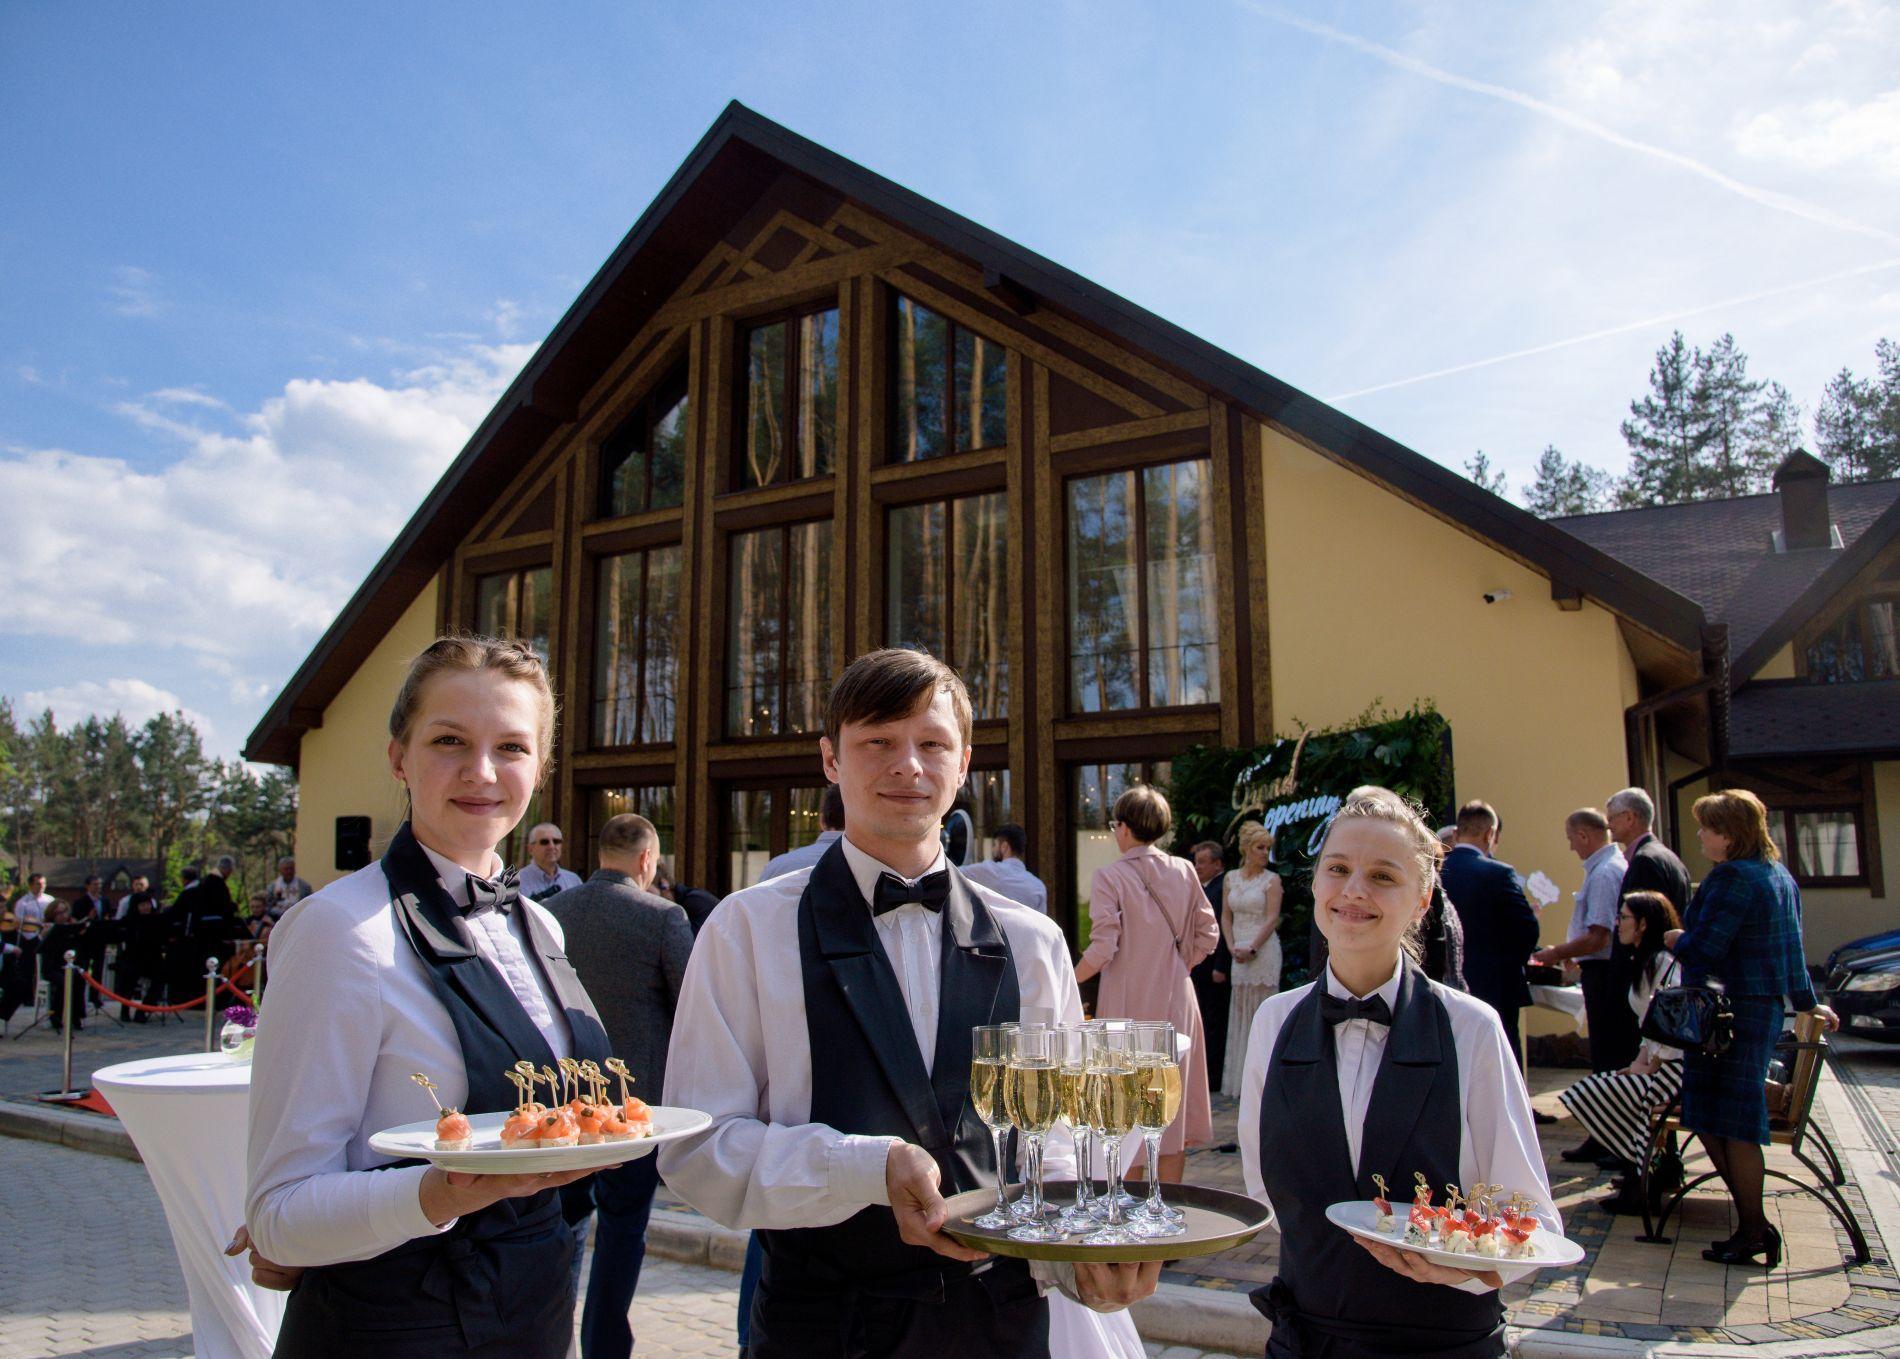 asparagus-restaurant-kryve-ozero-openinig_0324_HBR_LUFA-014